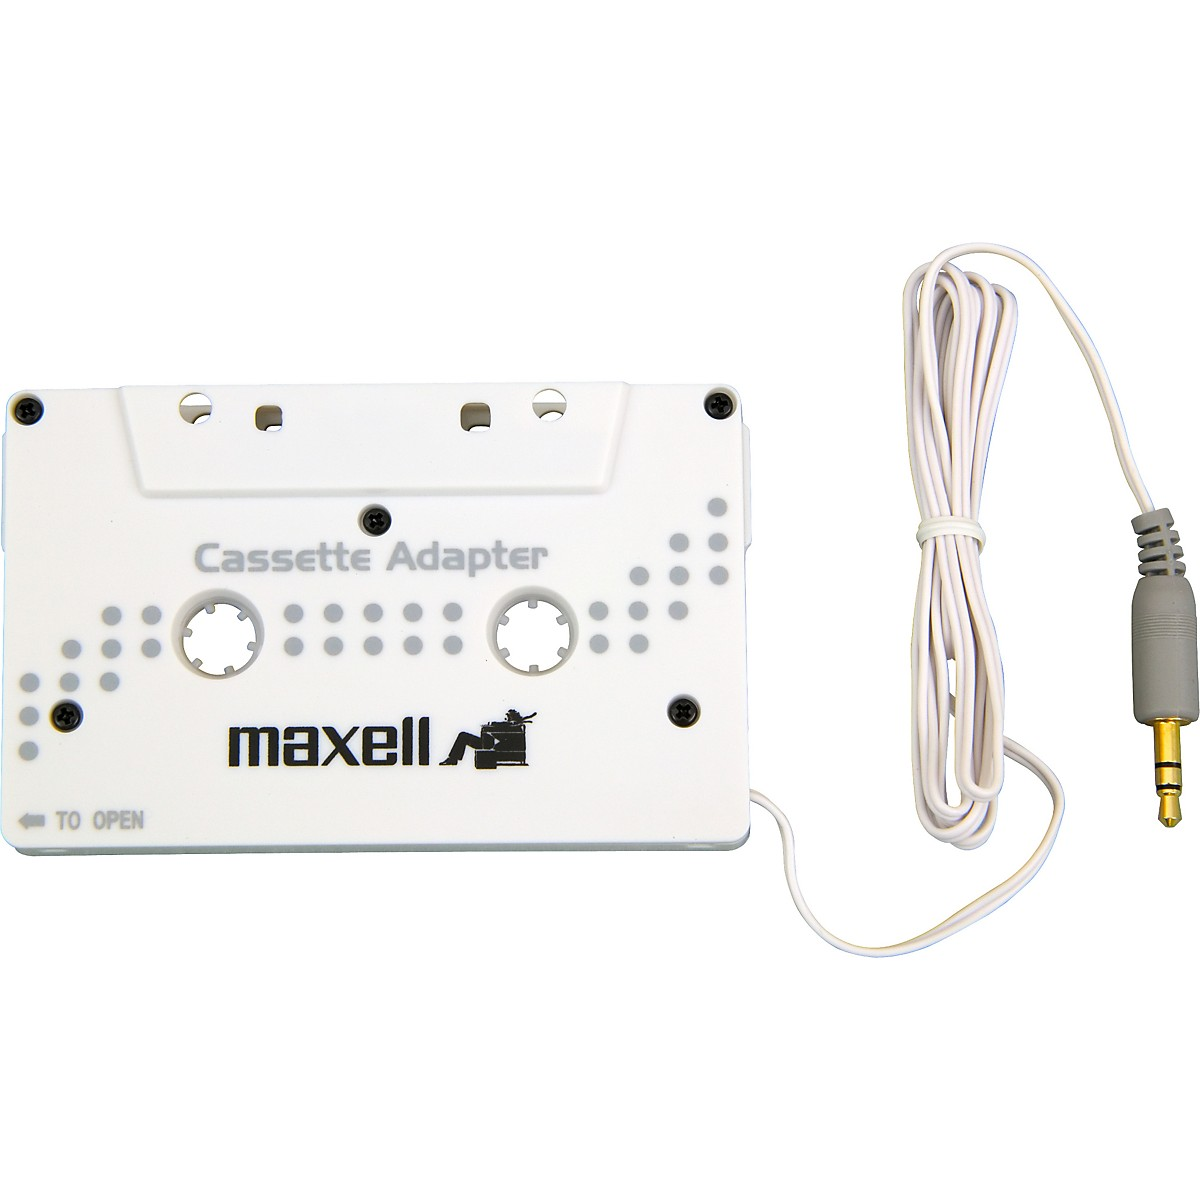 Maxell P-10 Cassette Adapter